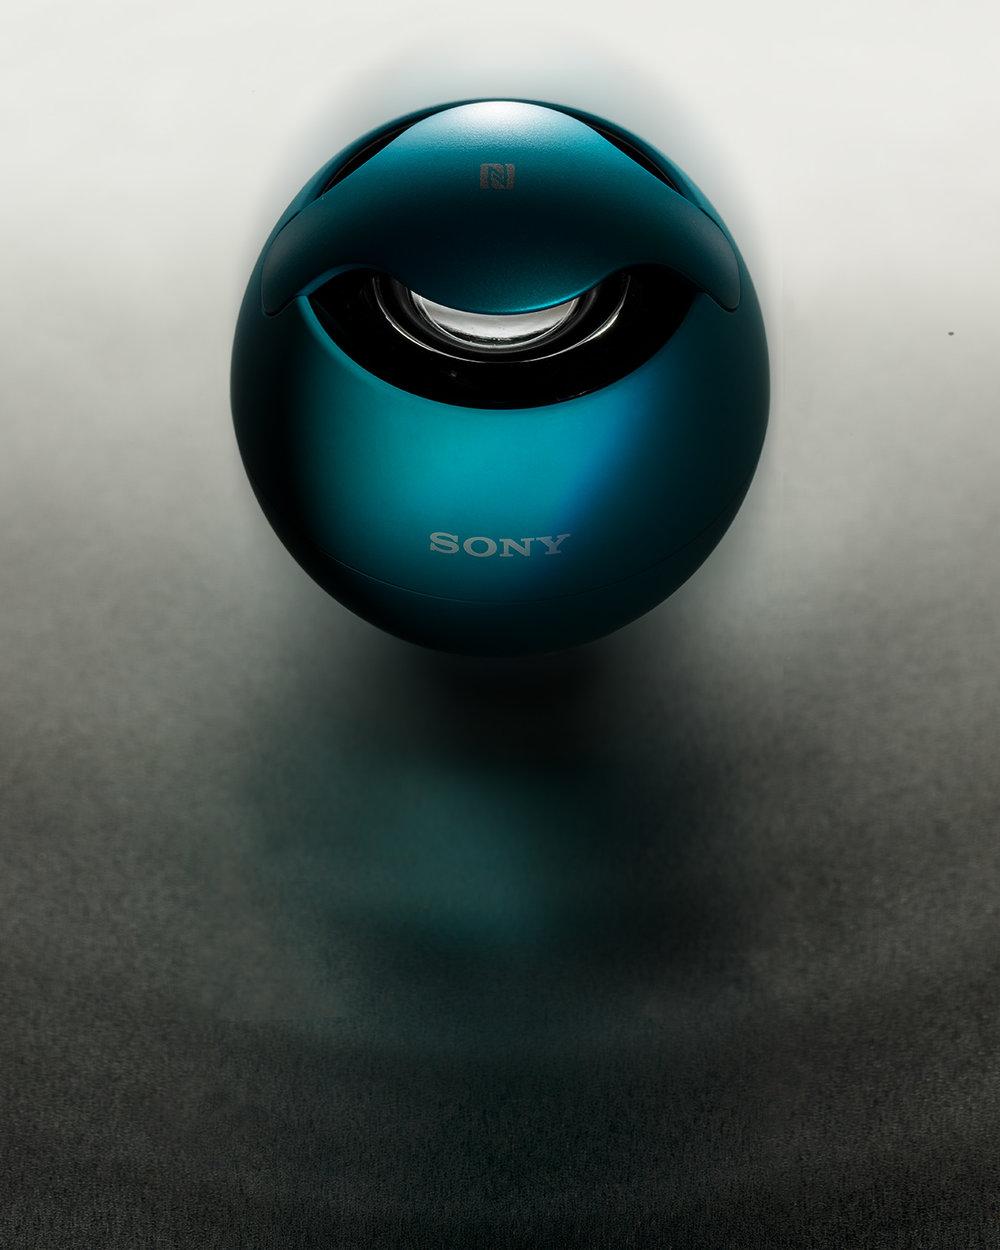 sony_ball.jpg